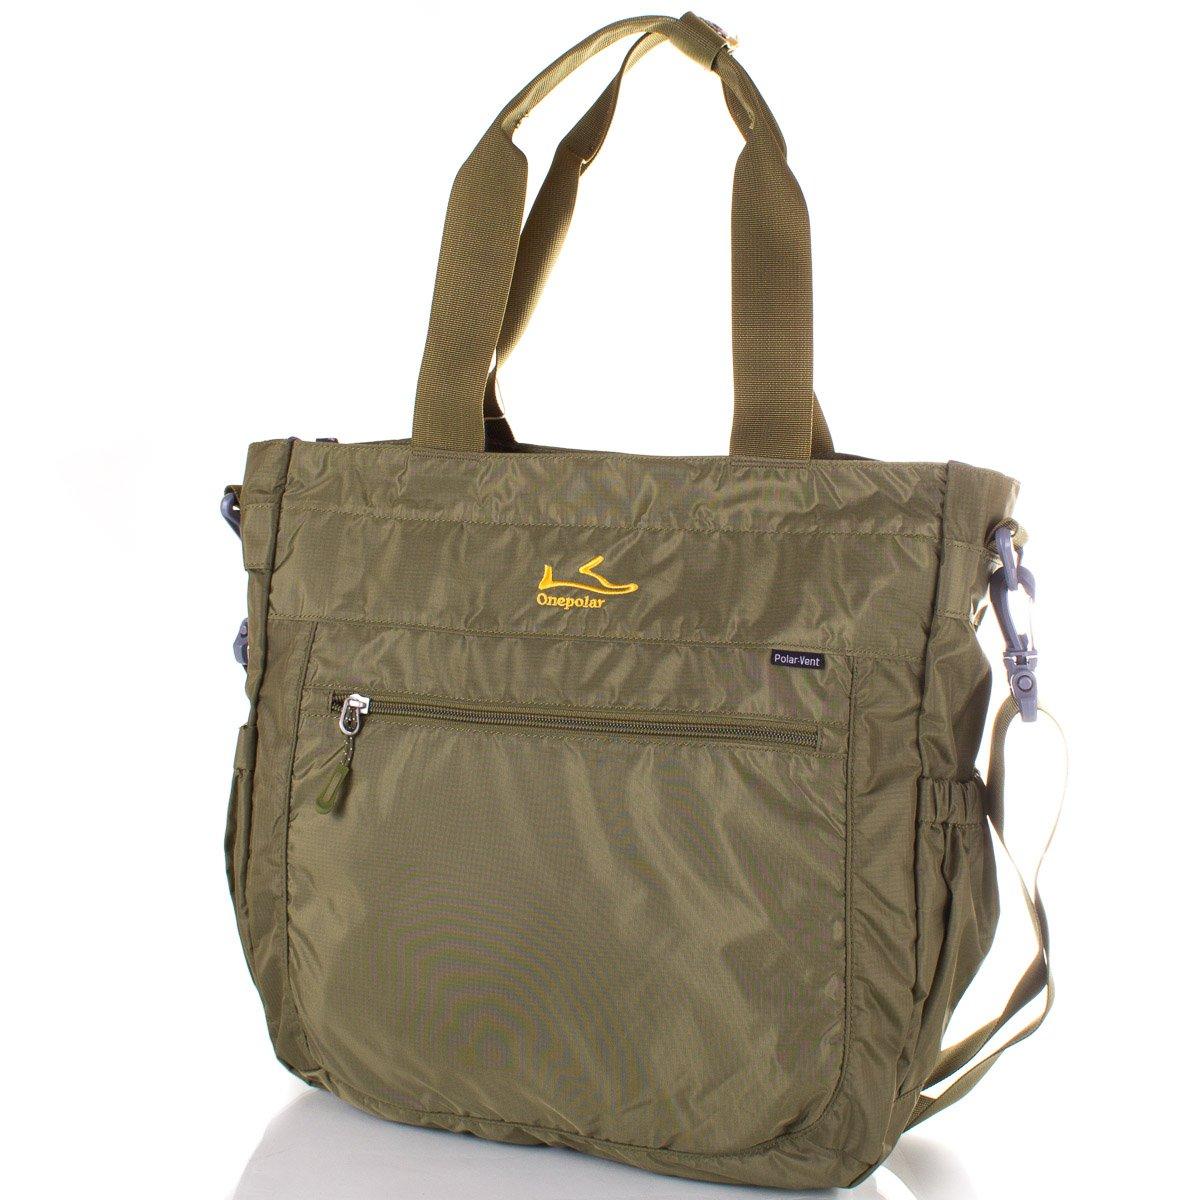 d059185cf71a Мужская спортивная сумка через плечо ONEPOLAR (ВАНПОЛАР) W5239-green ...